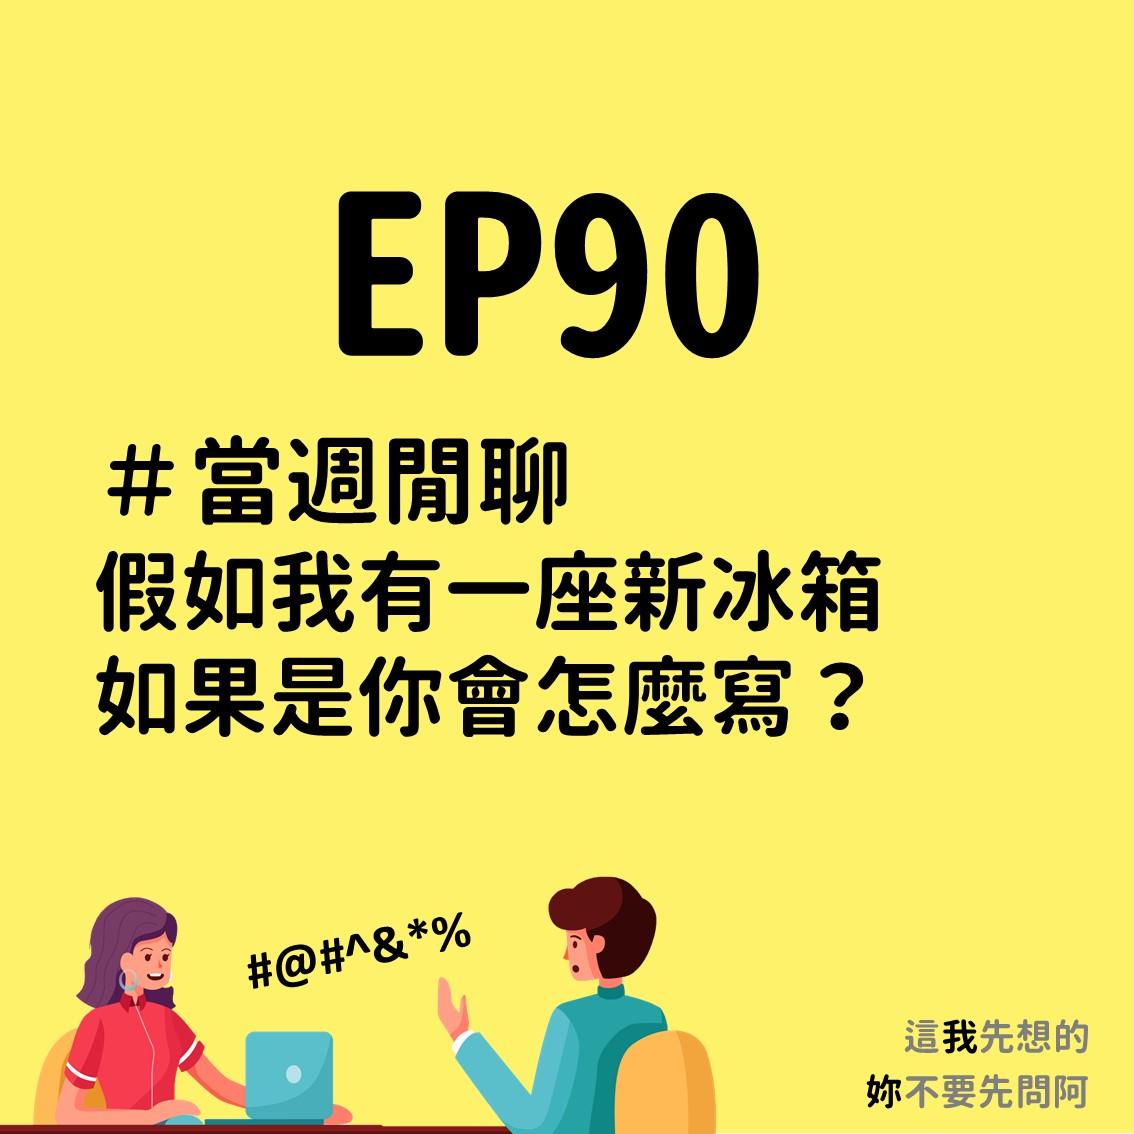 EP90 當週閒聊|假如我有一座新冰箱,如果是你會怎麼寫?